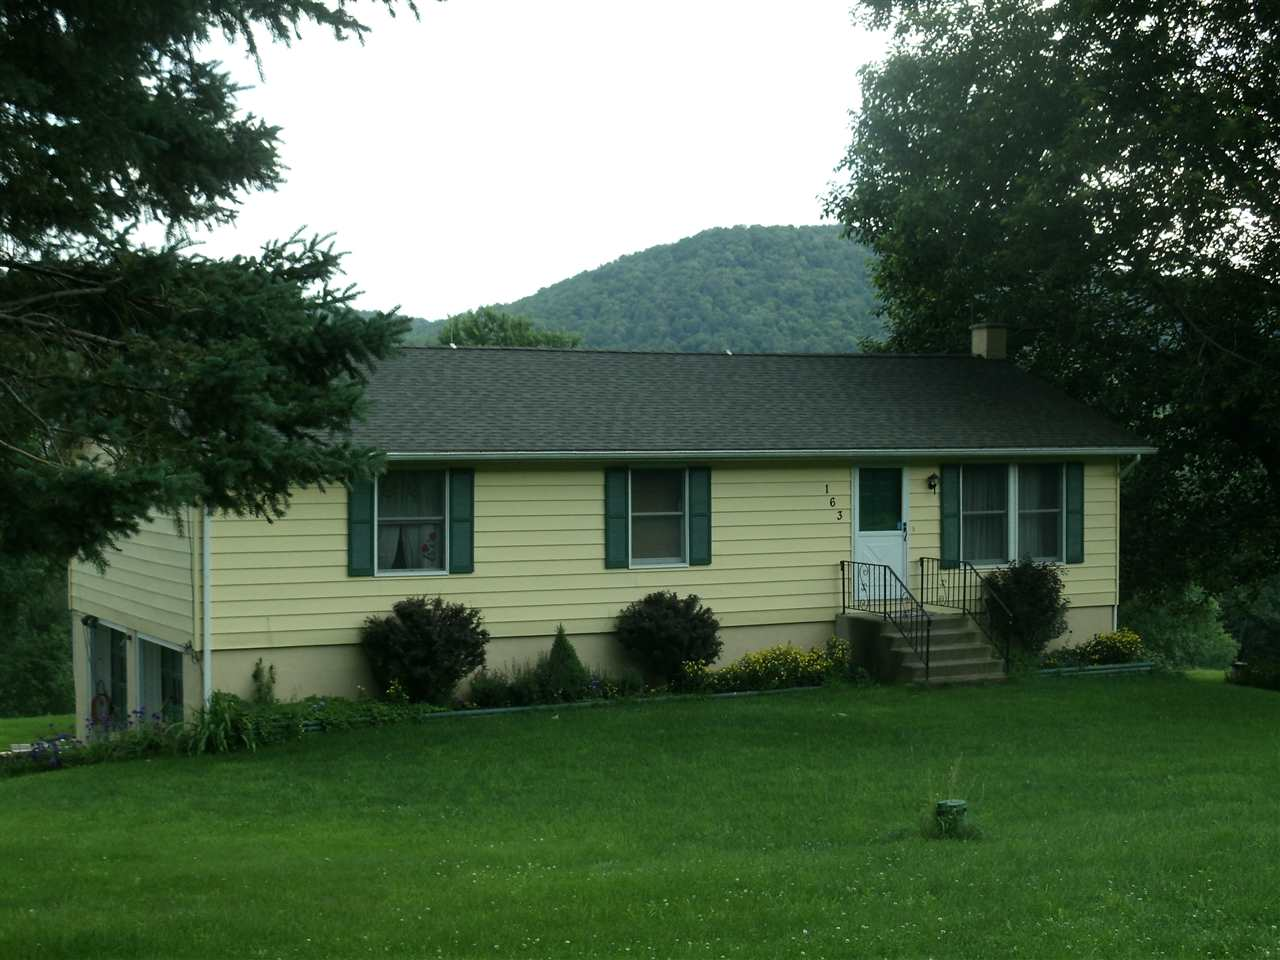 163 Dyker Rd, North Branch, NY 12766